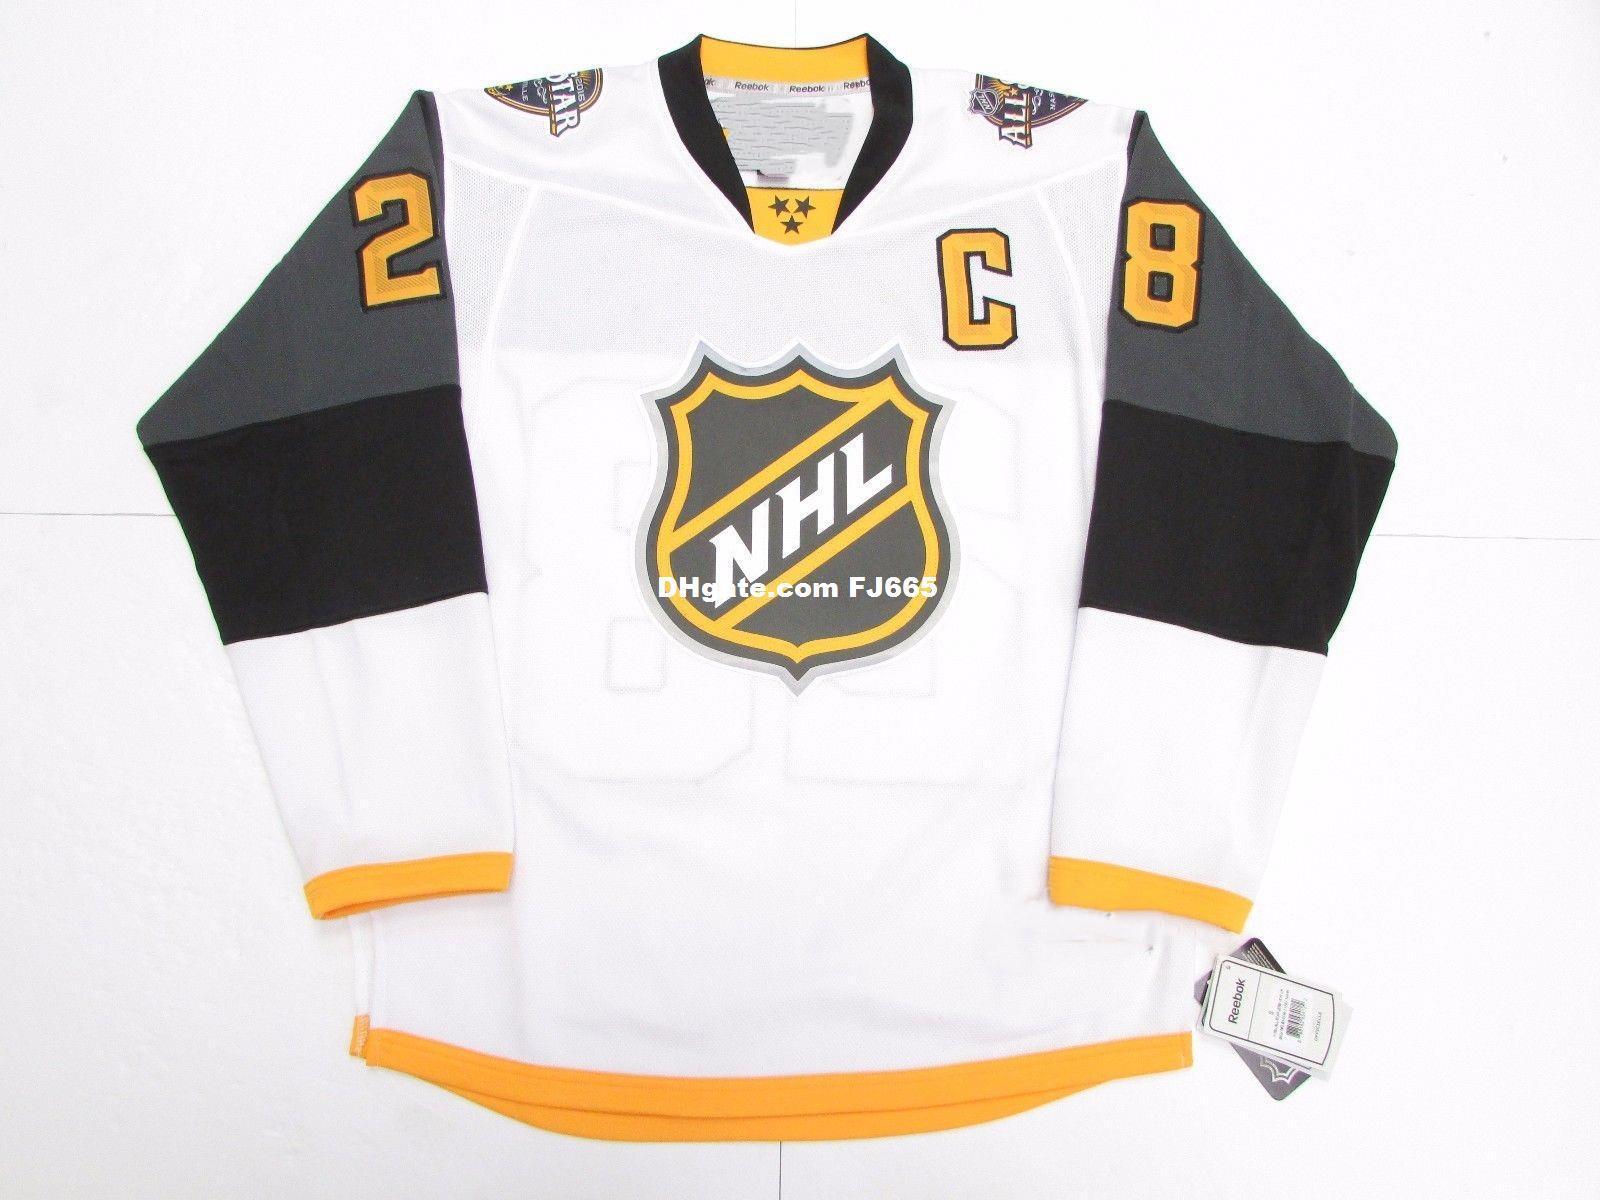 764850f12 Customize JOHN SCOTT 2016 NHL ALL STAR GAME NASHVILLE WHITE PREMIER JERSEY  XS-5XL Customize JOHN SCOTT 2016 Wholesale Online with $65.69/Piece on ...